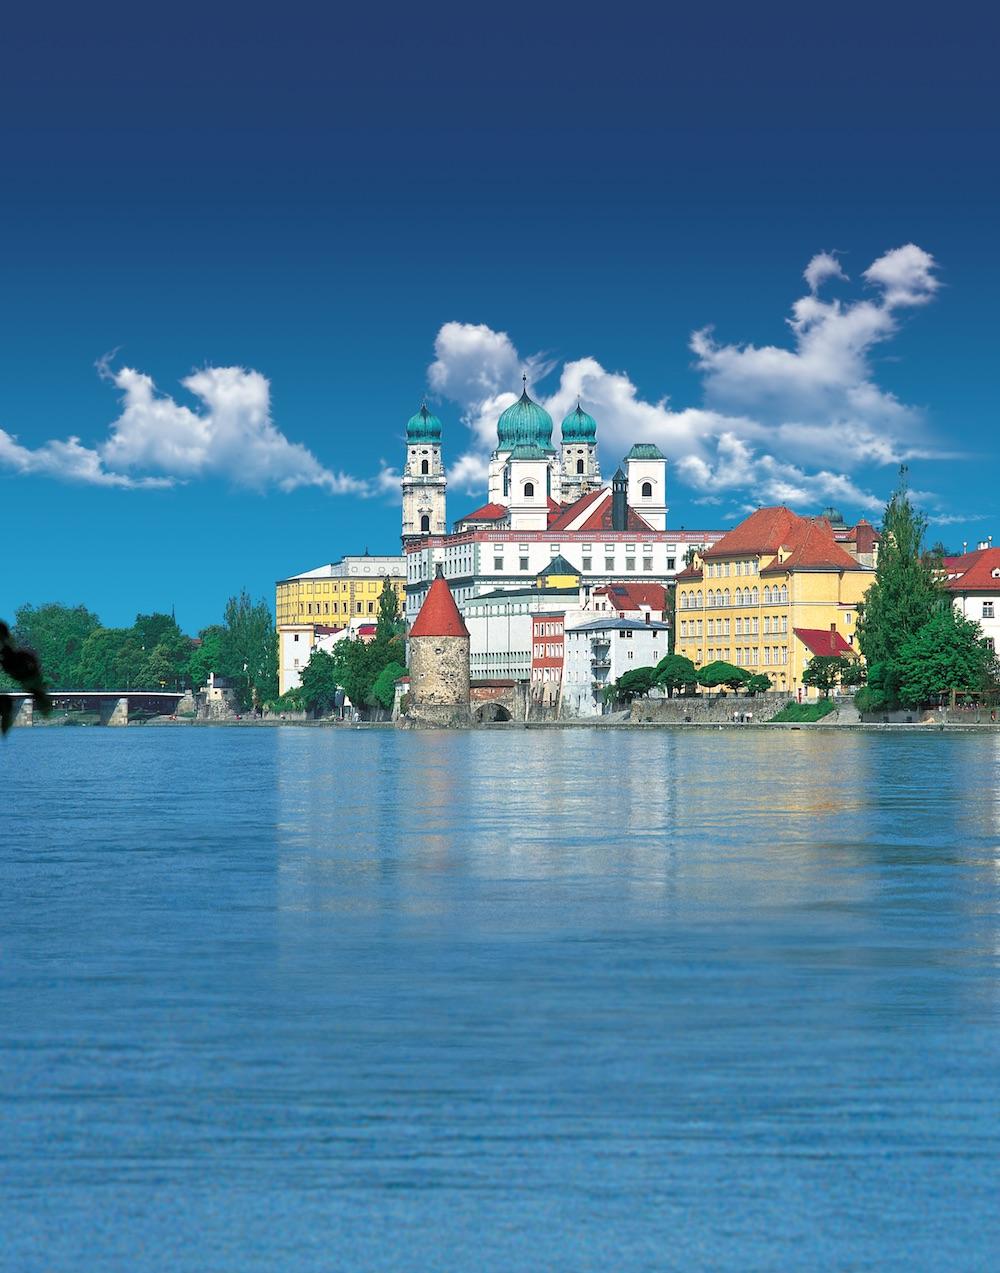 CC_Passau_Cathedral_Riverside.jpg